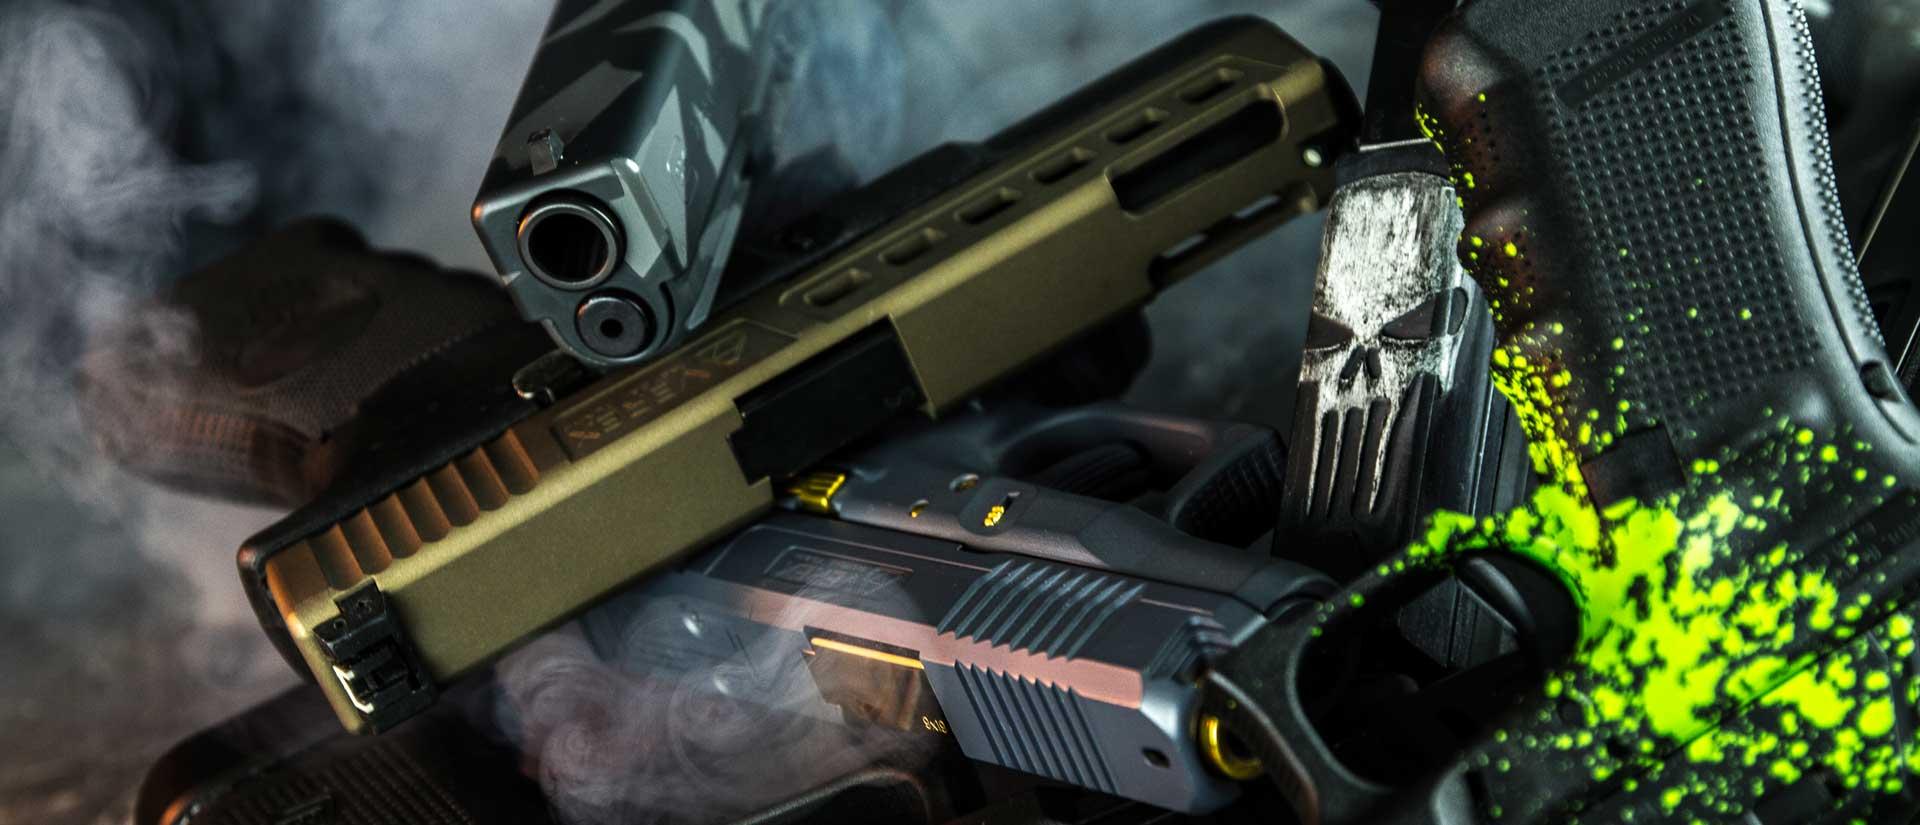 verex-tactical-tuning-waffen-pistole-glock-sig-sauer-17-cz-walther-visier-bruenieren-ar15-red-dot-beschichtung-tuning-cerakote-stippling-griptech-salzburg-slider-05